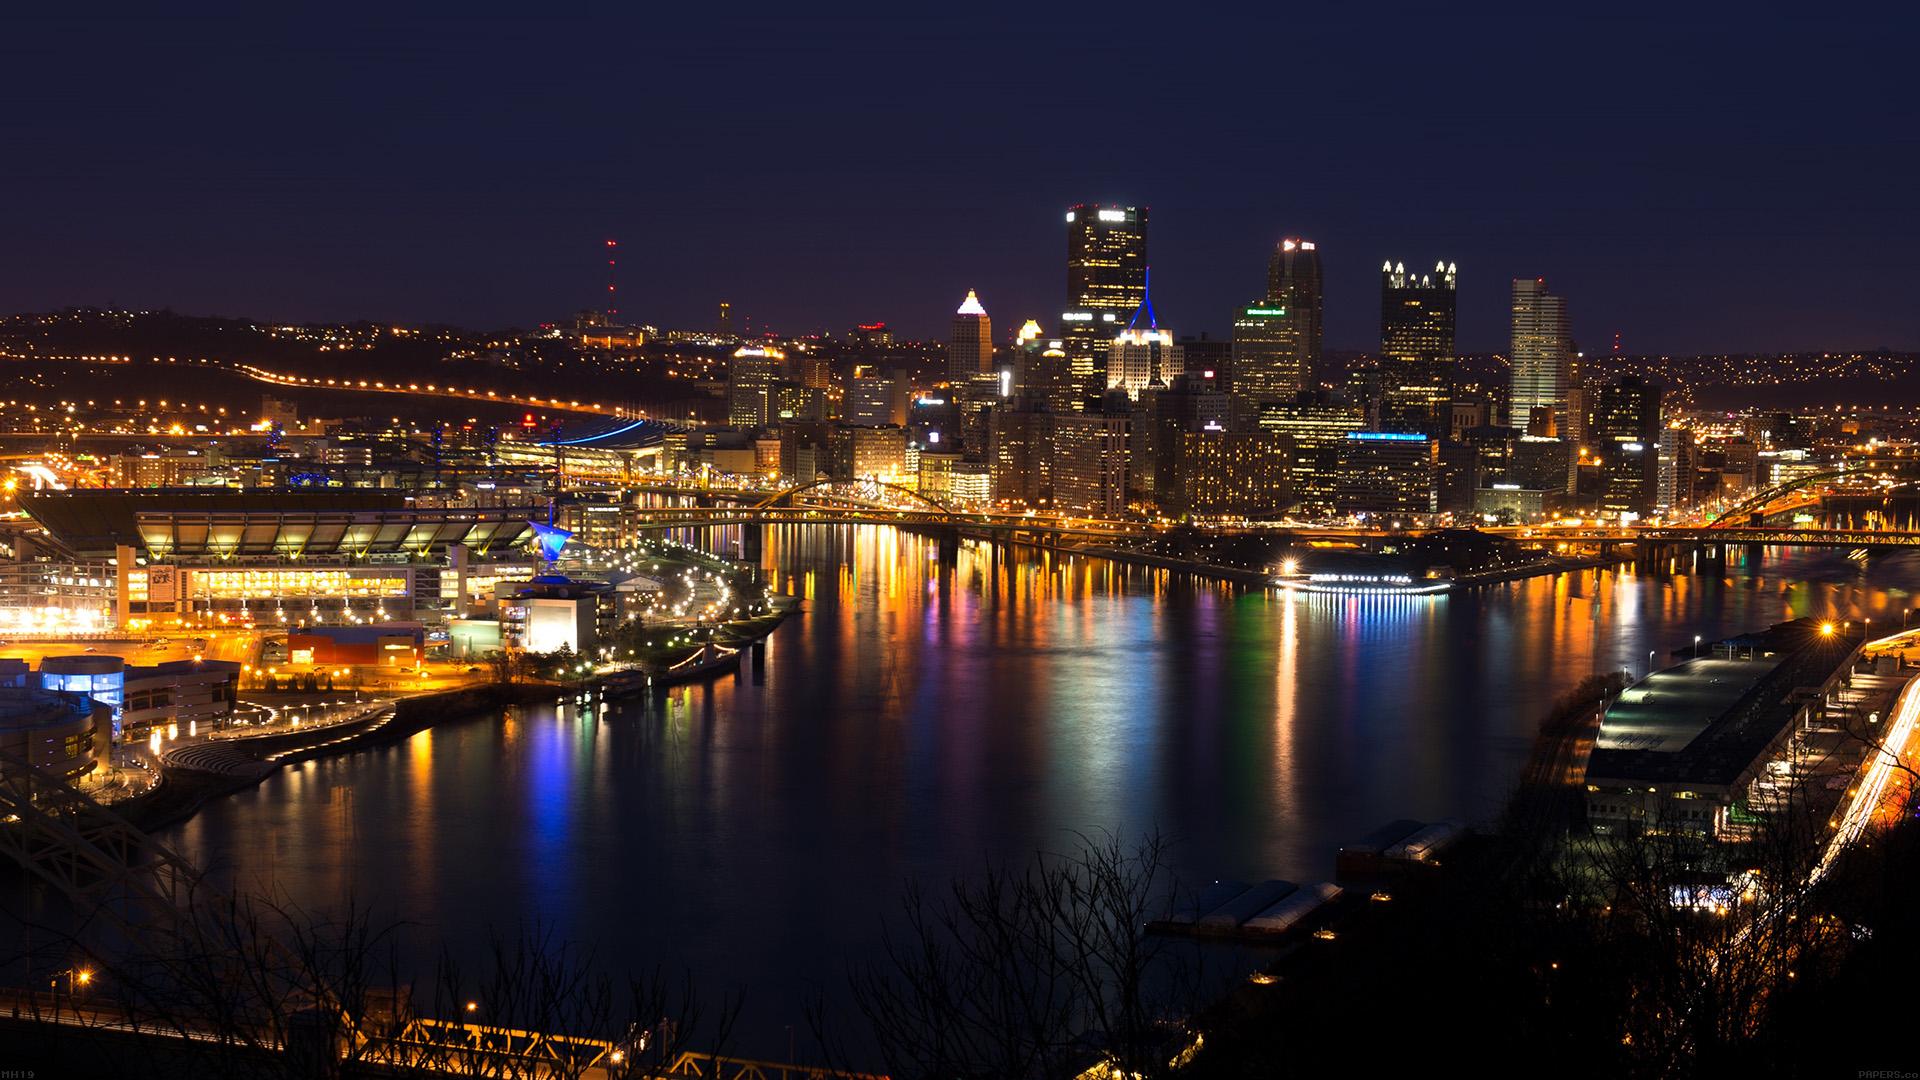 Pittsburgh Desktop Wallpaper Skyline: Mh19-pittsburgh-skyline-night-cityview-nature